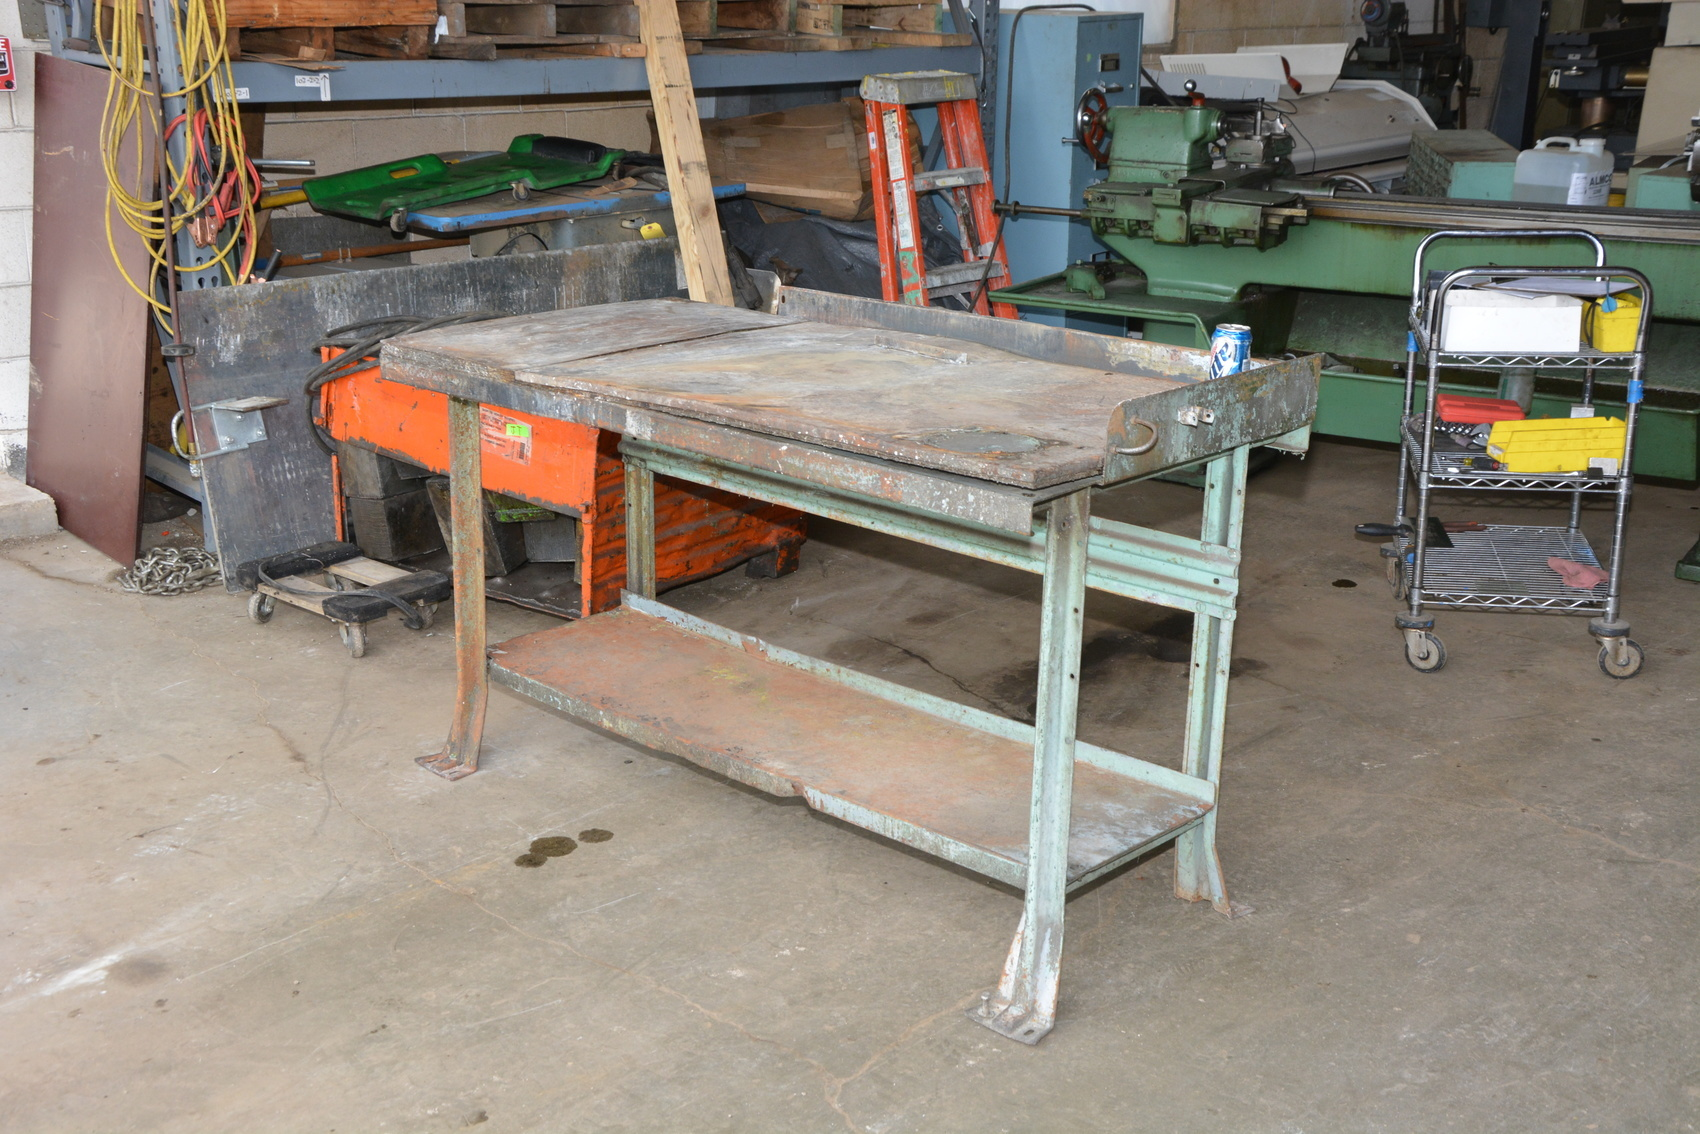 Heavy Duty Industrial Work Bench Workbench Table 60x29x36 Equipto Lyon Inv 17716 Ebay